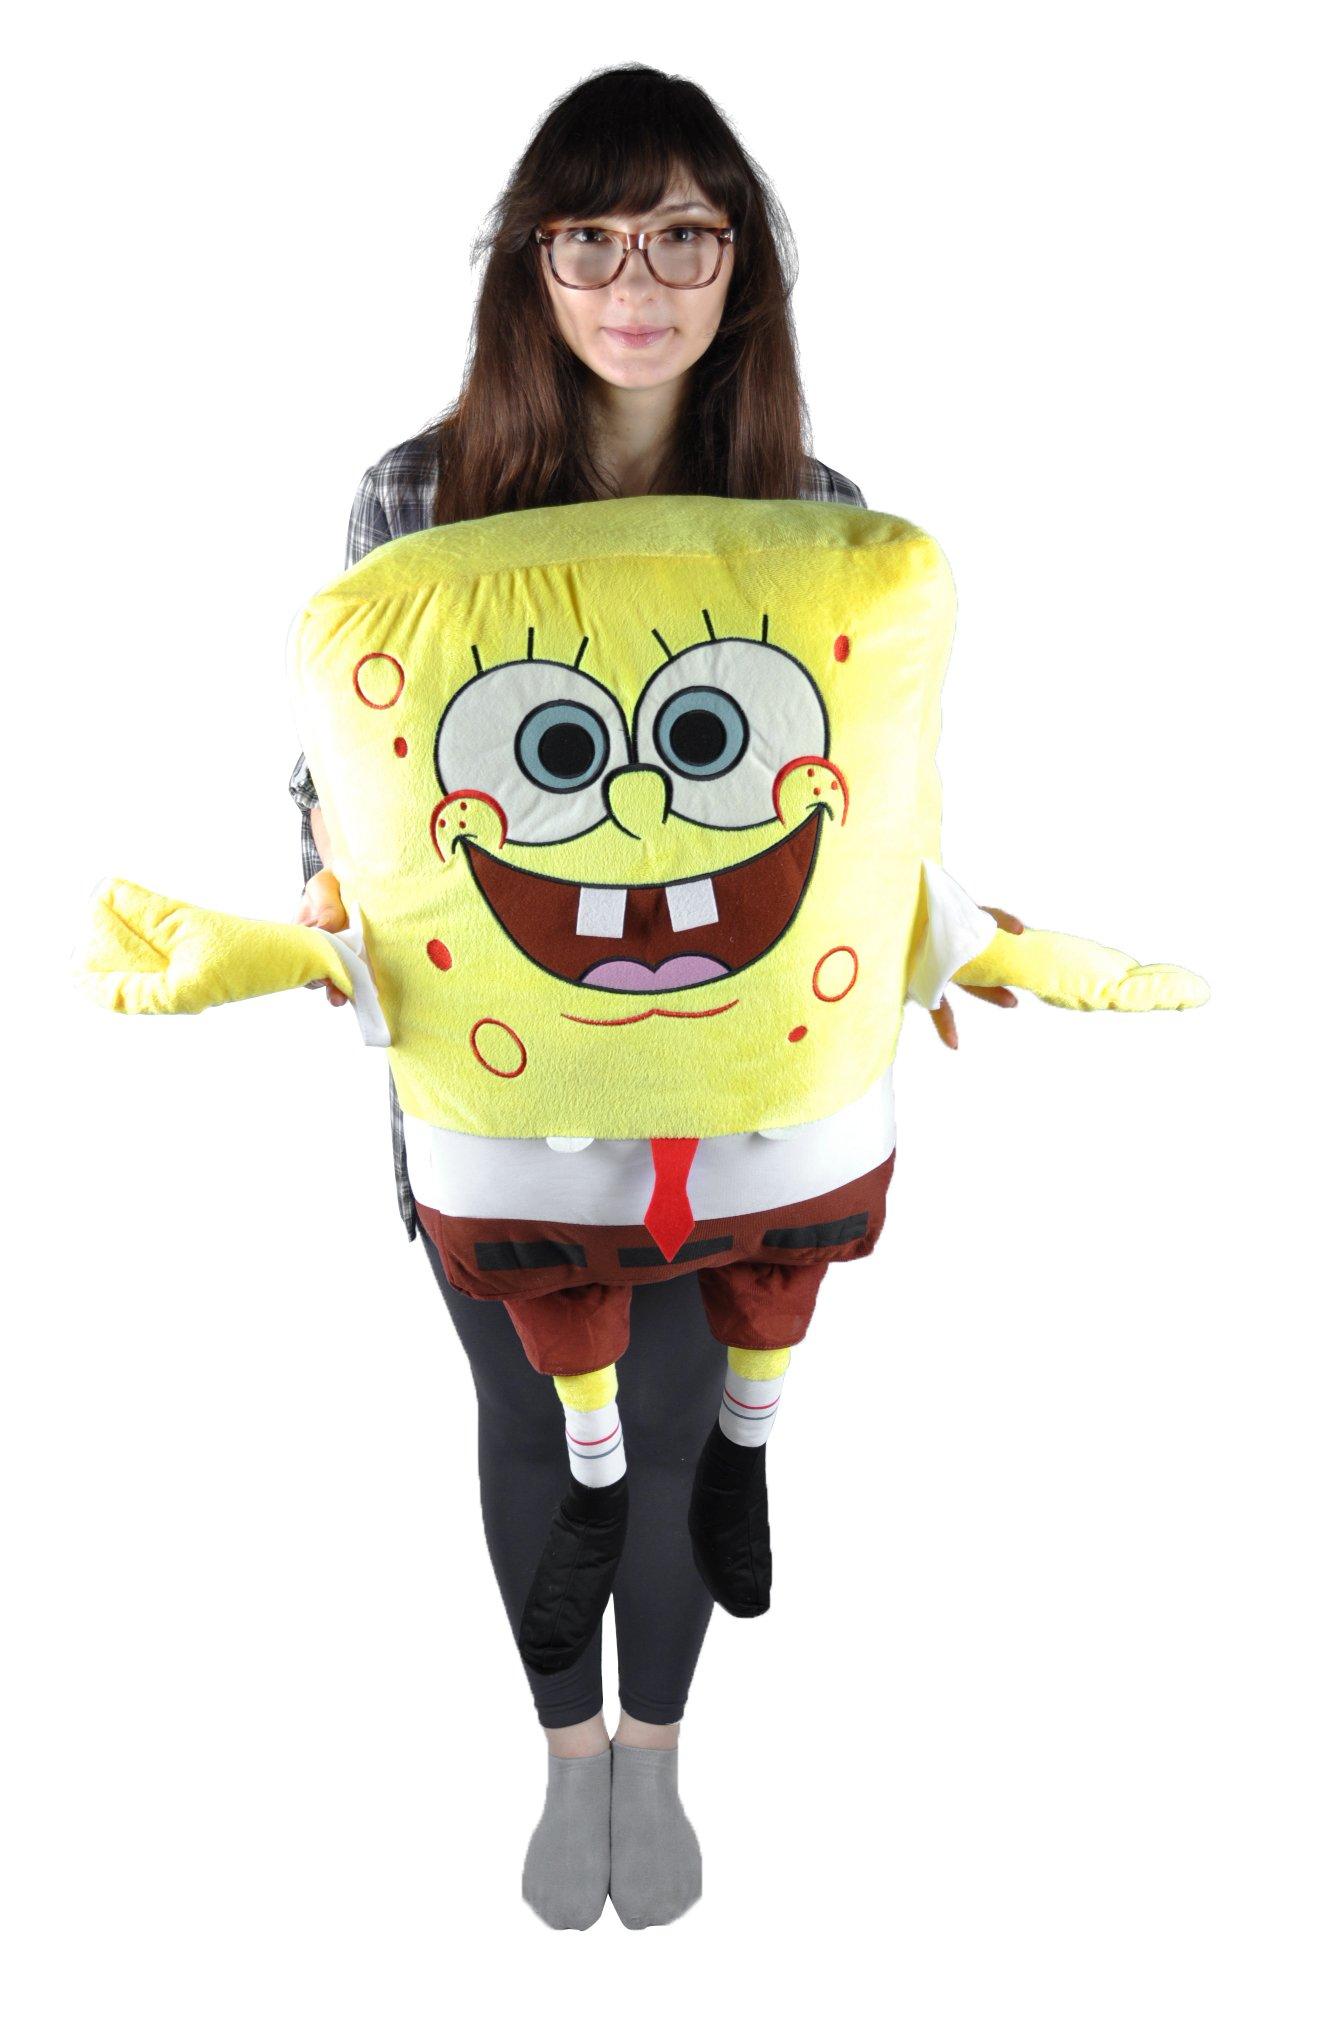 Large Size Super Giant 39 Inch /100cm Spongebob Plush Stuffed Soft Toy Fluffy Pillow and Cushion by SpongeBob SquarePants